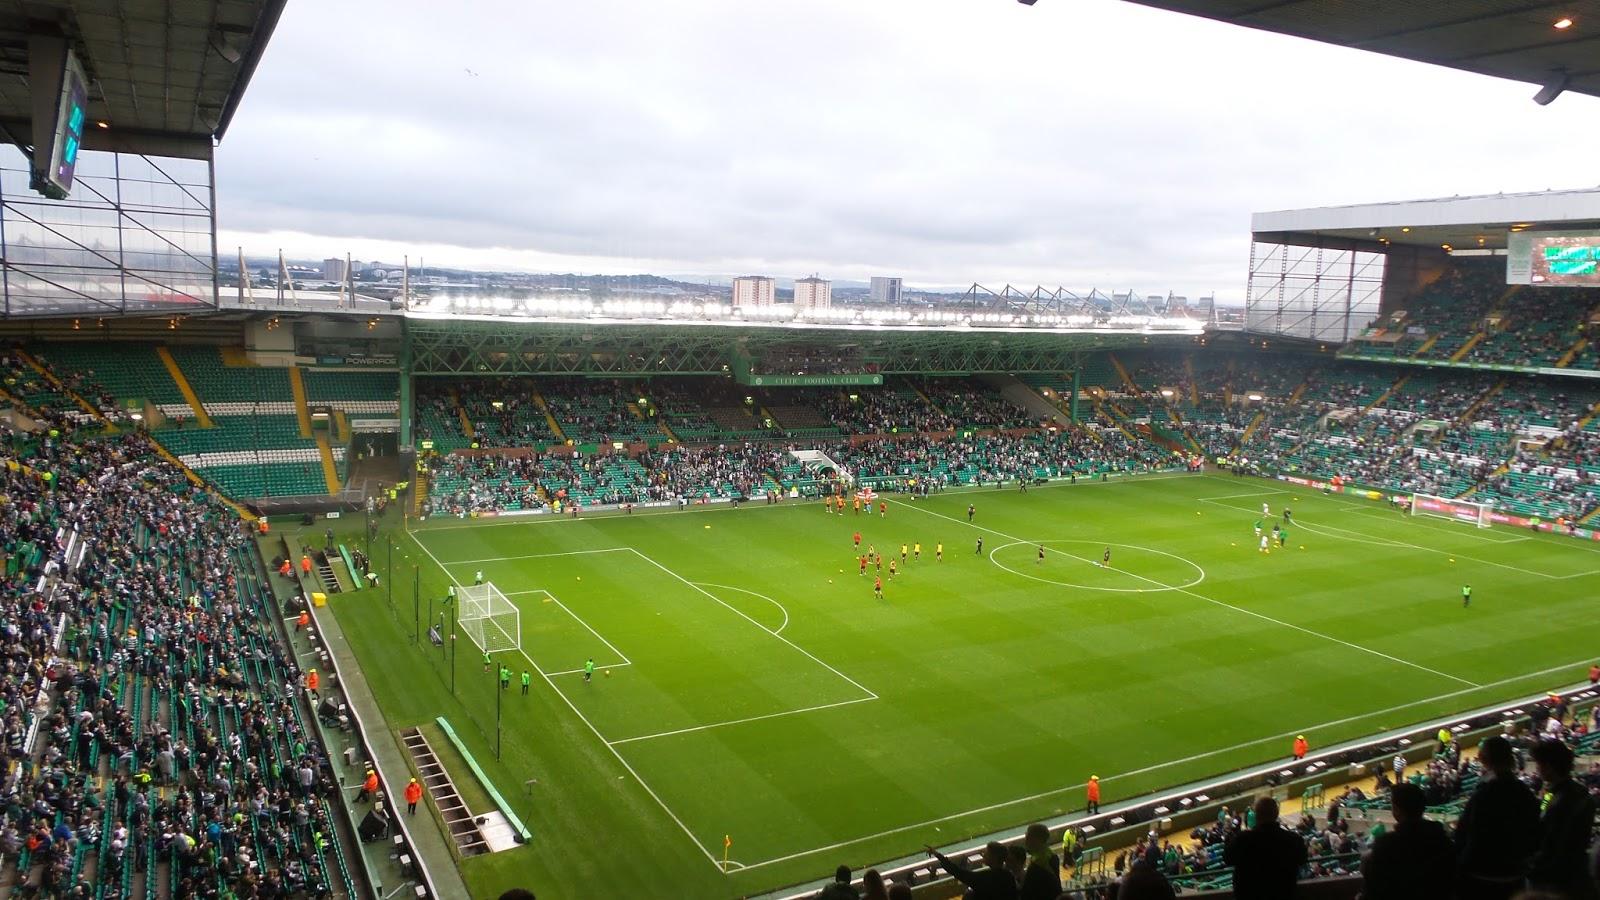 The Wycombe Wanderer: Glasgow Celtic - Celtic Park